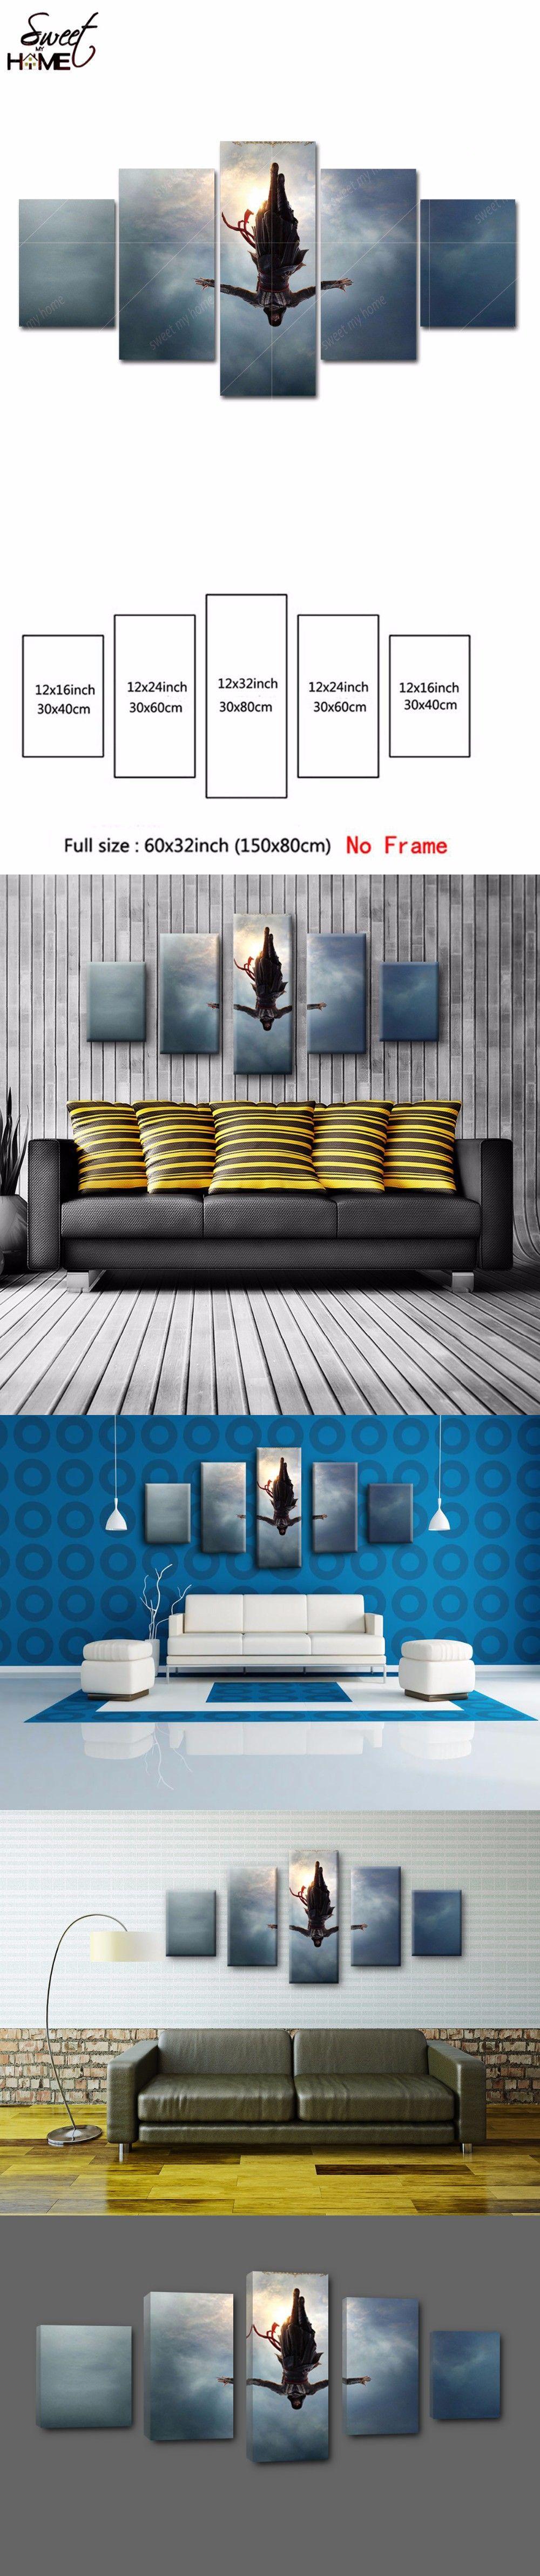 5 panels modern home decor assassins creed movie pictures wall art 5 panels modern home decor assassins creed movie pictures wall art living room painting large canvas art unframed